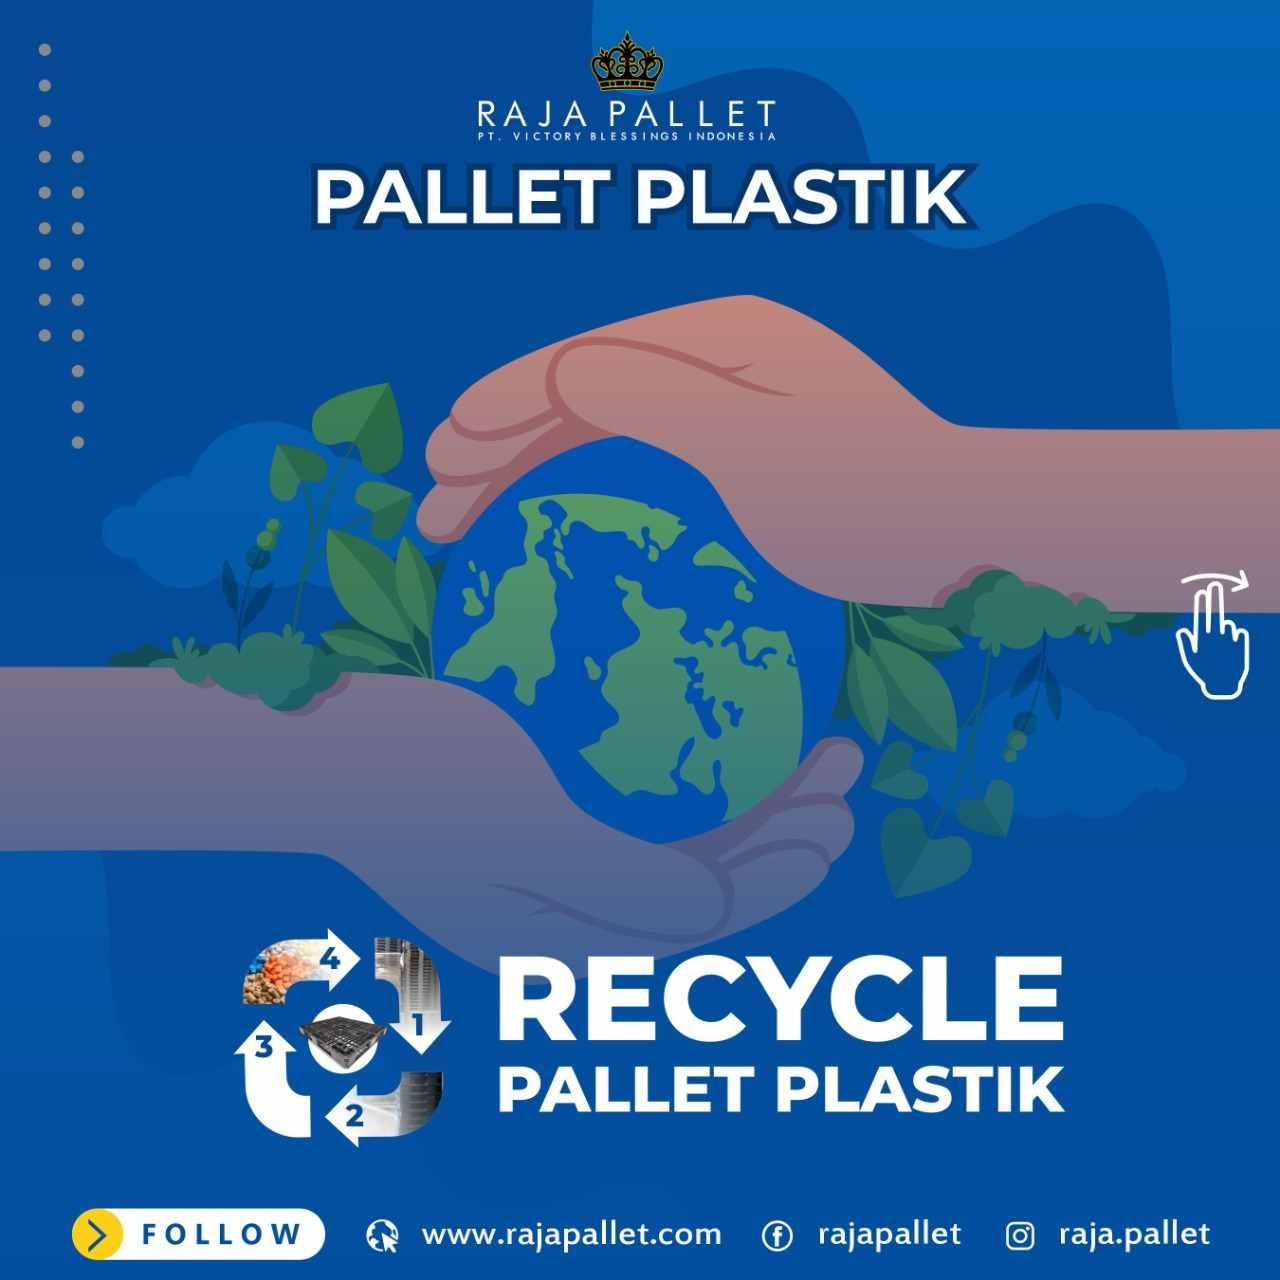 Pallet Plastik Baru Rajapallet Ramah Lingkungan Harga Murah